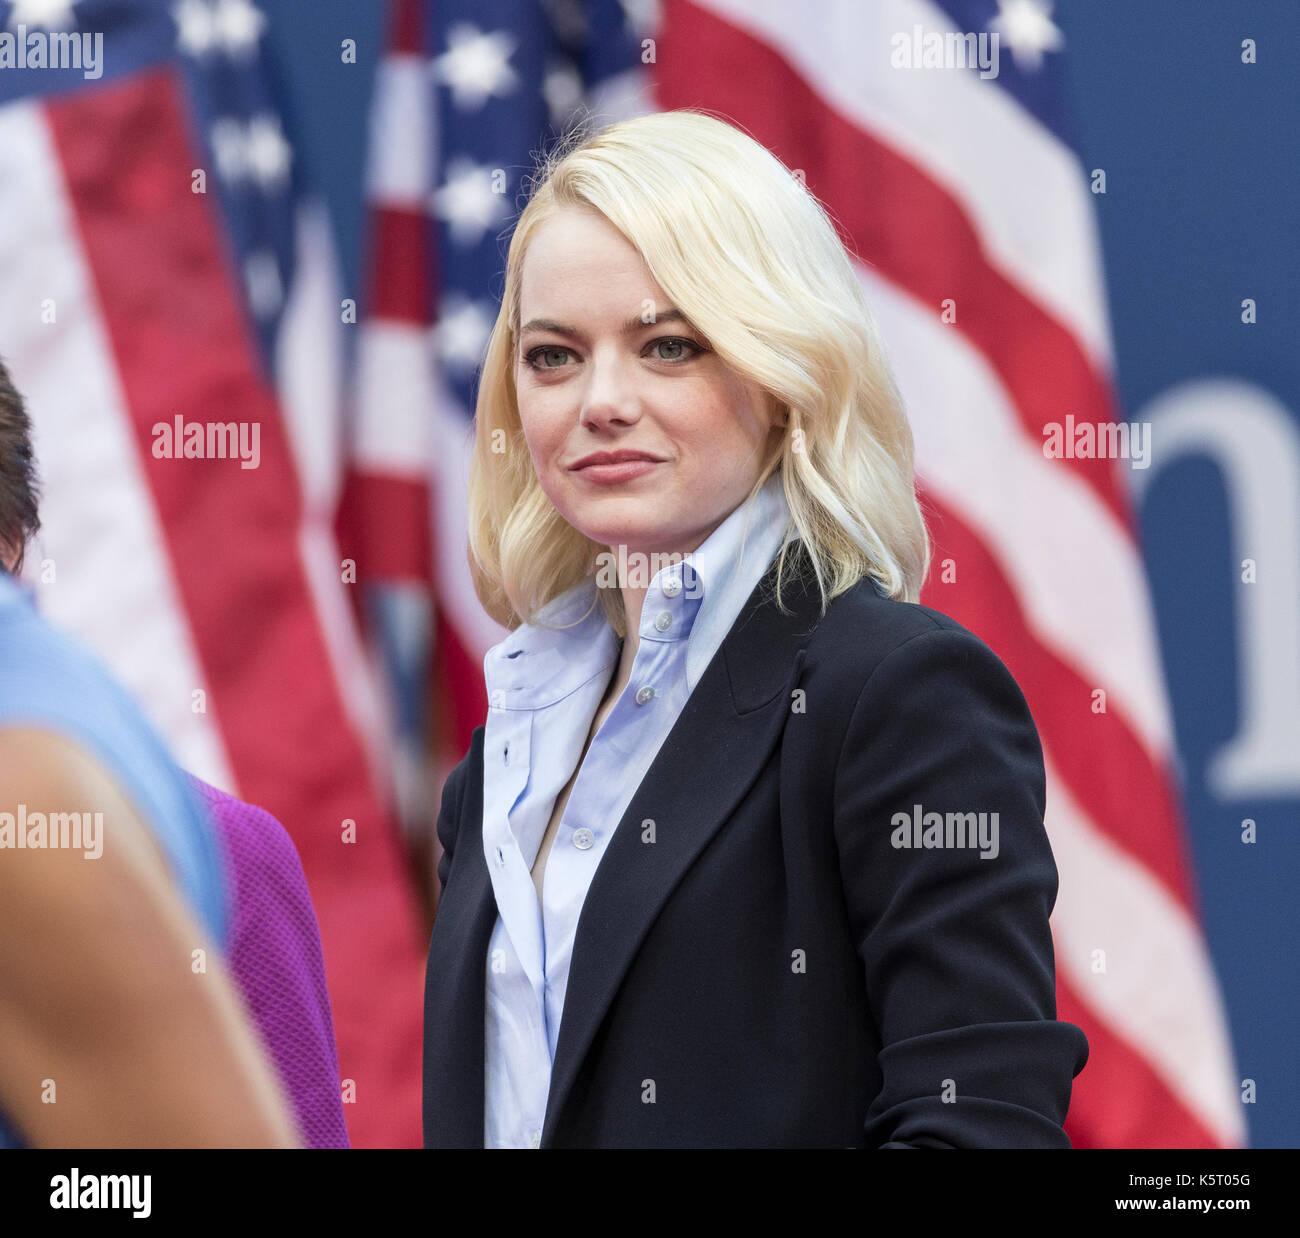 images Danni Ashe United States